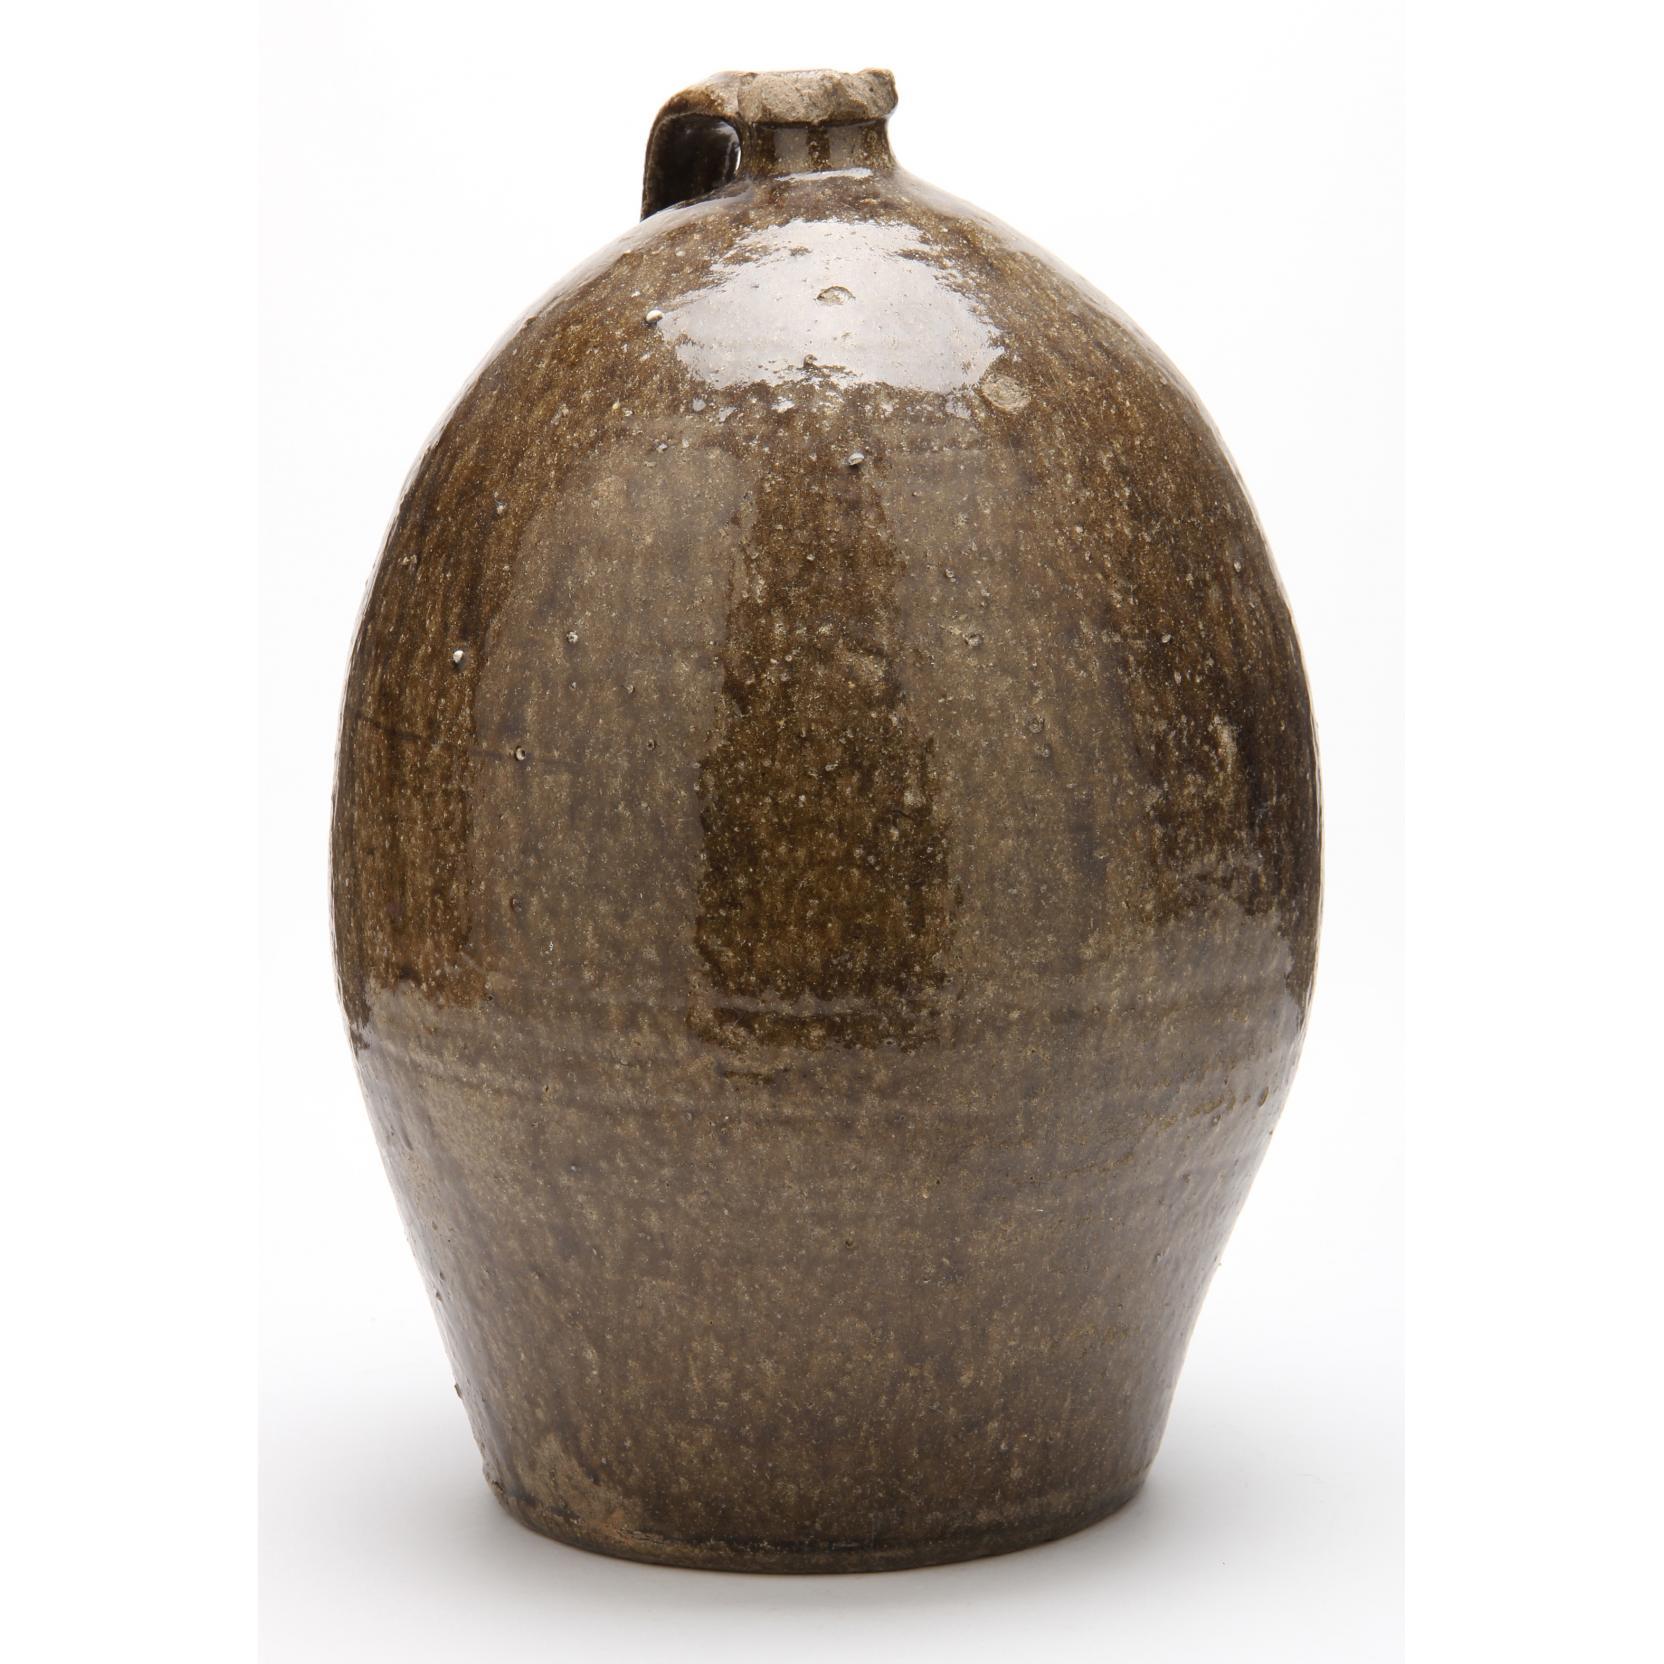 nc-pottery-three-gallon-jug-nelson-bass-1846-1918-lincoln-county